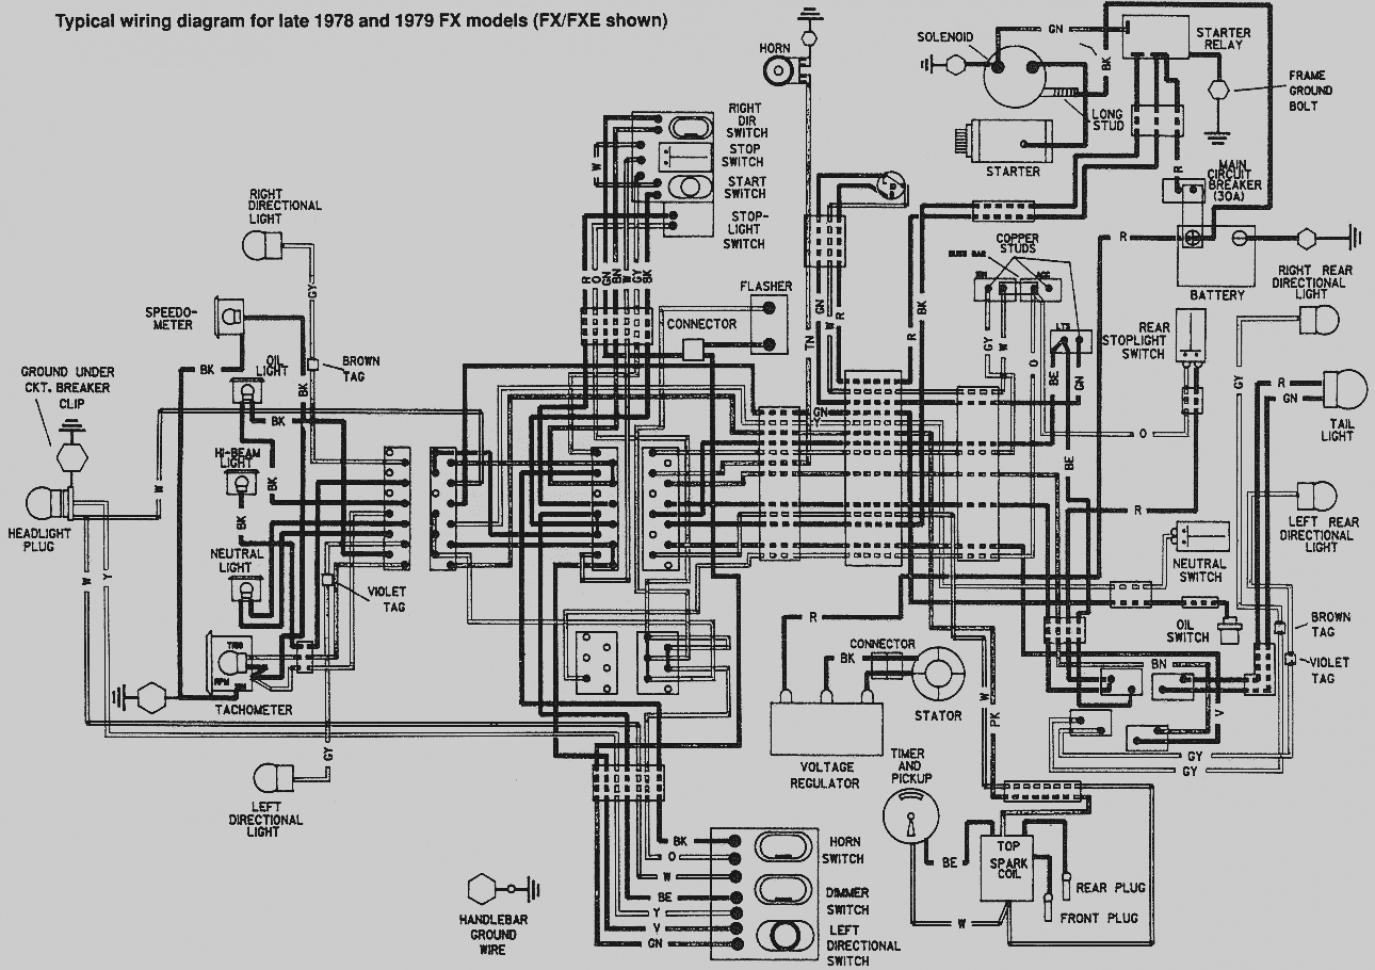 harley davidson big twin diagram wiring diagram